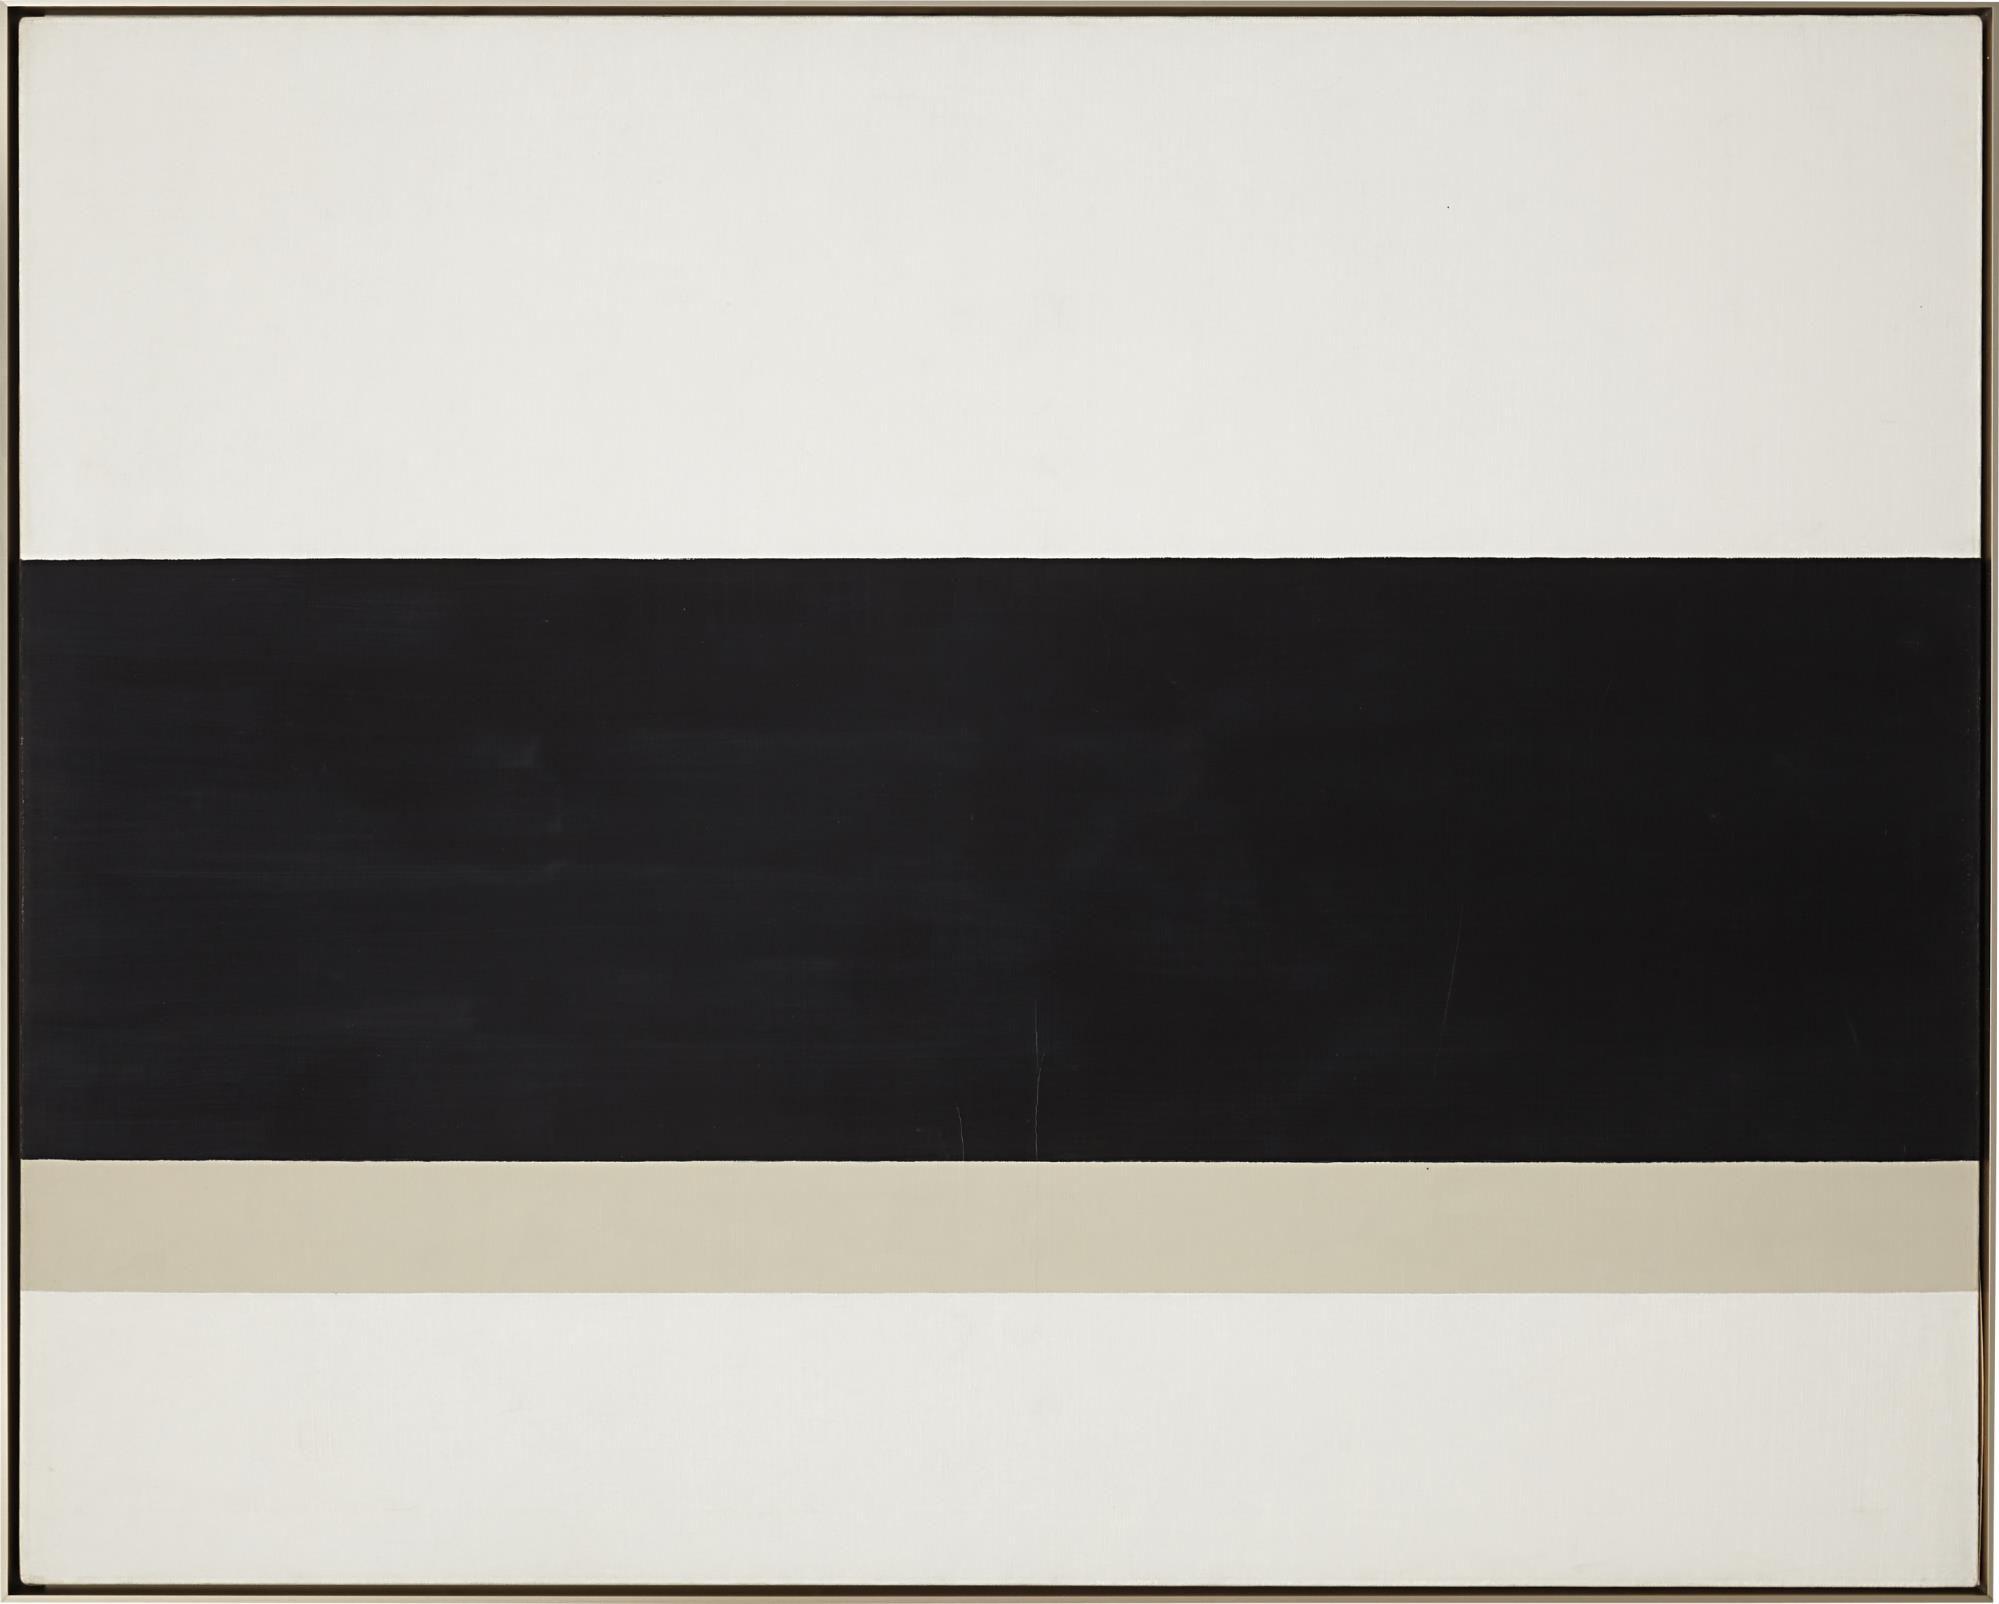 John Mclaughlin 1 1970 Oil On Canvas 48 X 60 In 121 9 X 152 4 Cm